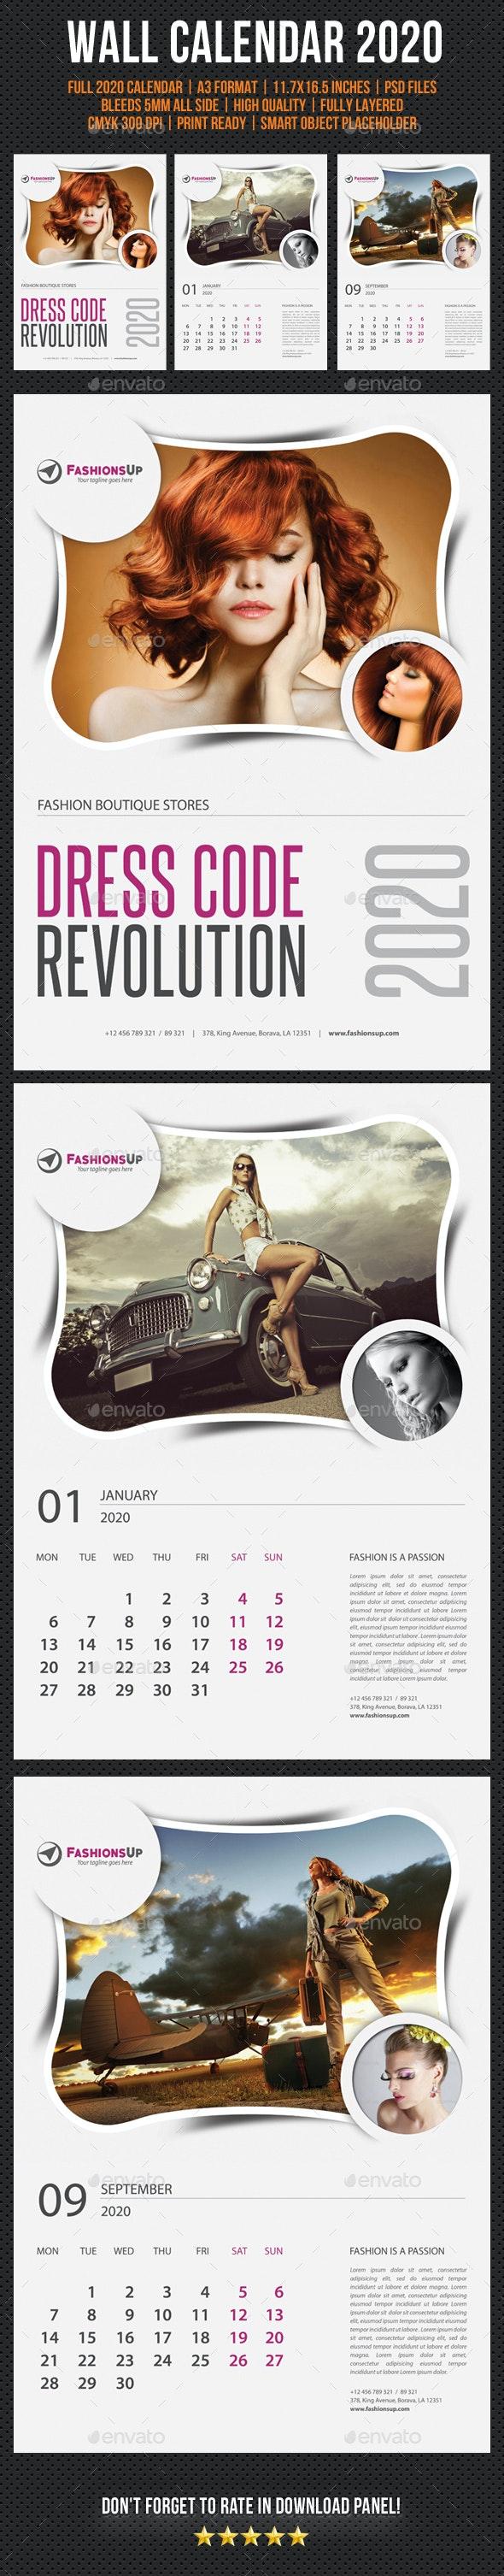 Wall Calendar 2020 V13 - Calendars Stationery